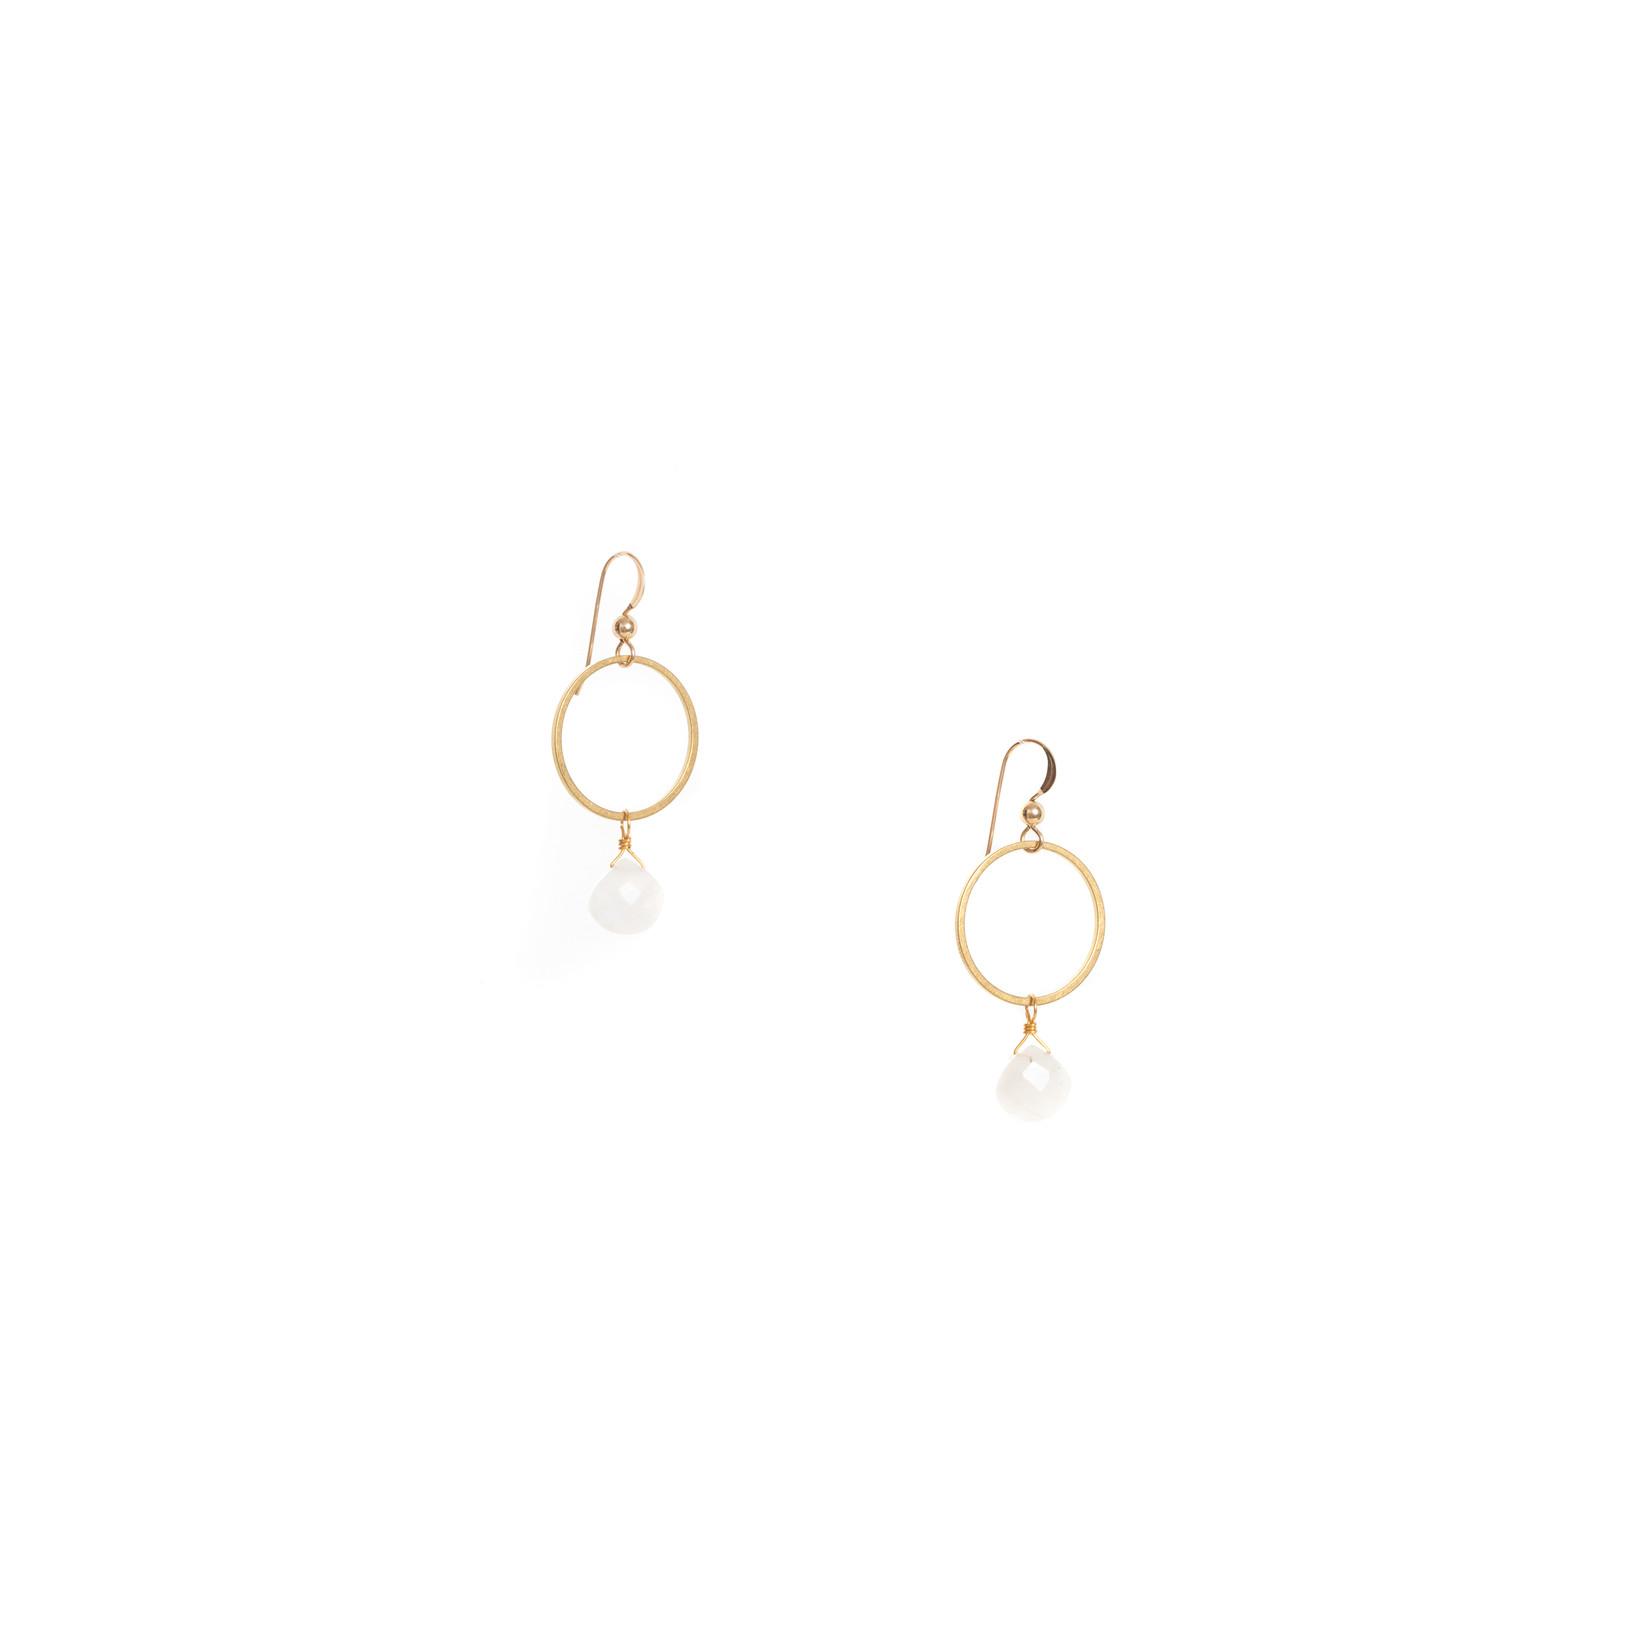 Hailey Gerrits Rhea Earrings